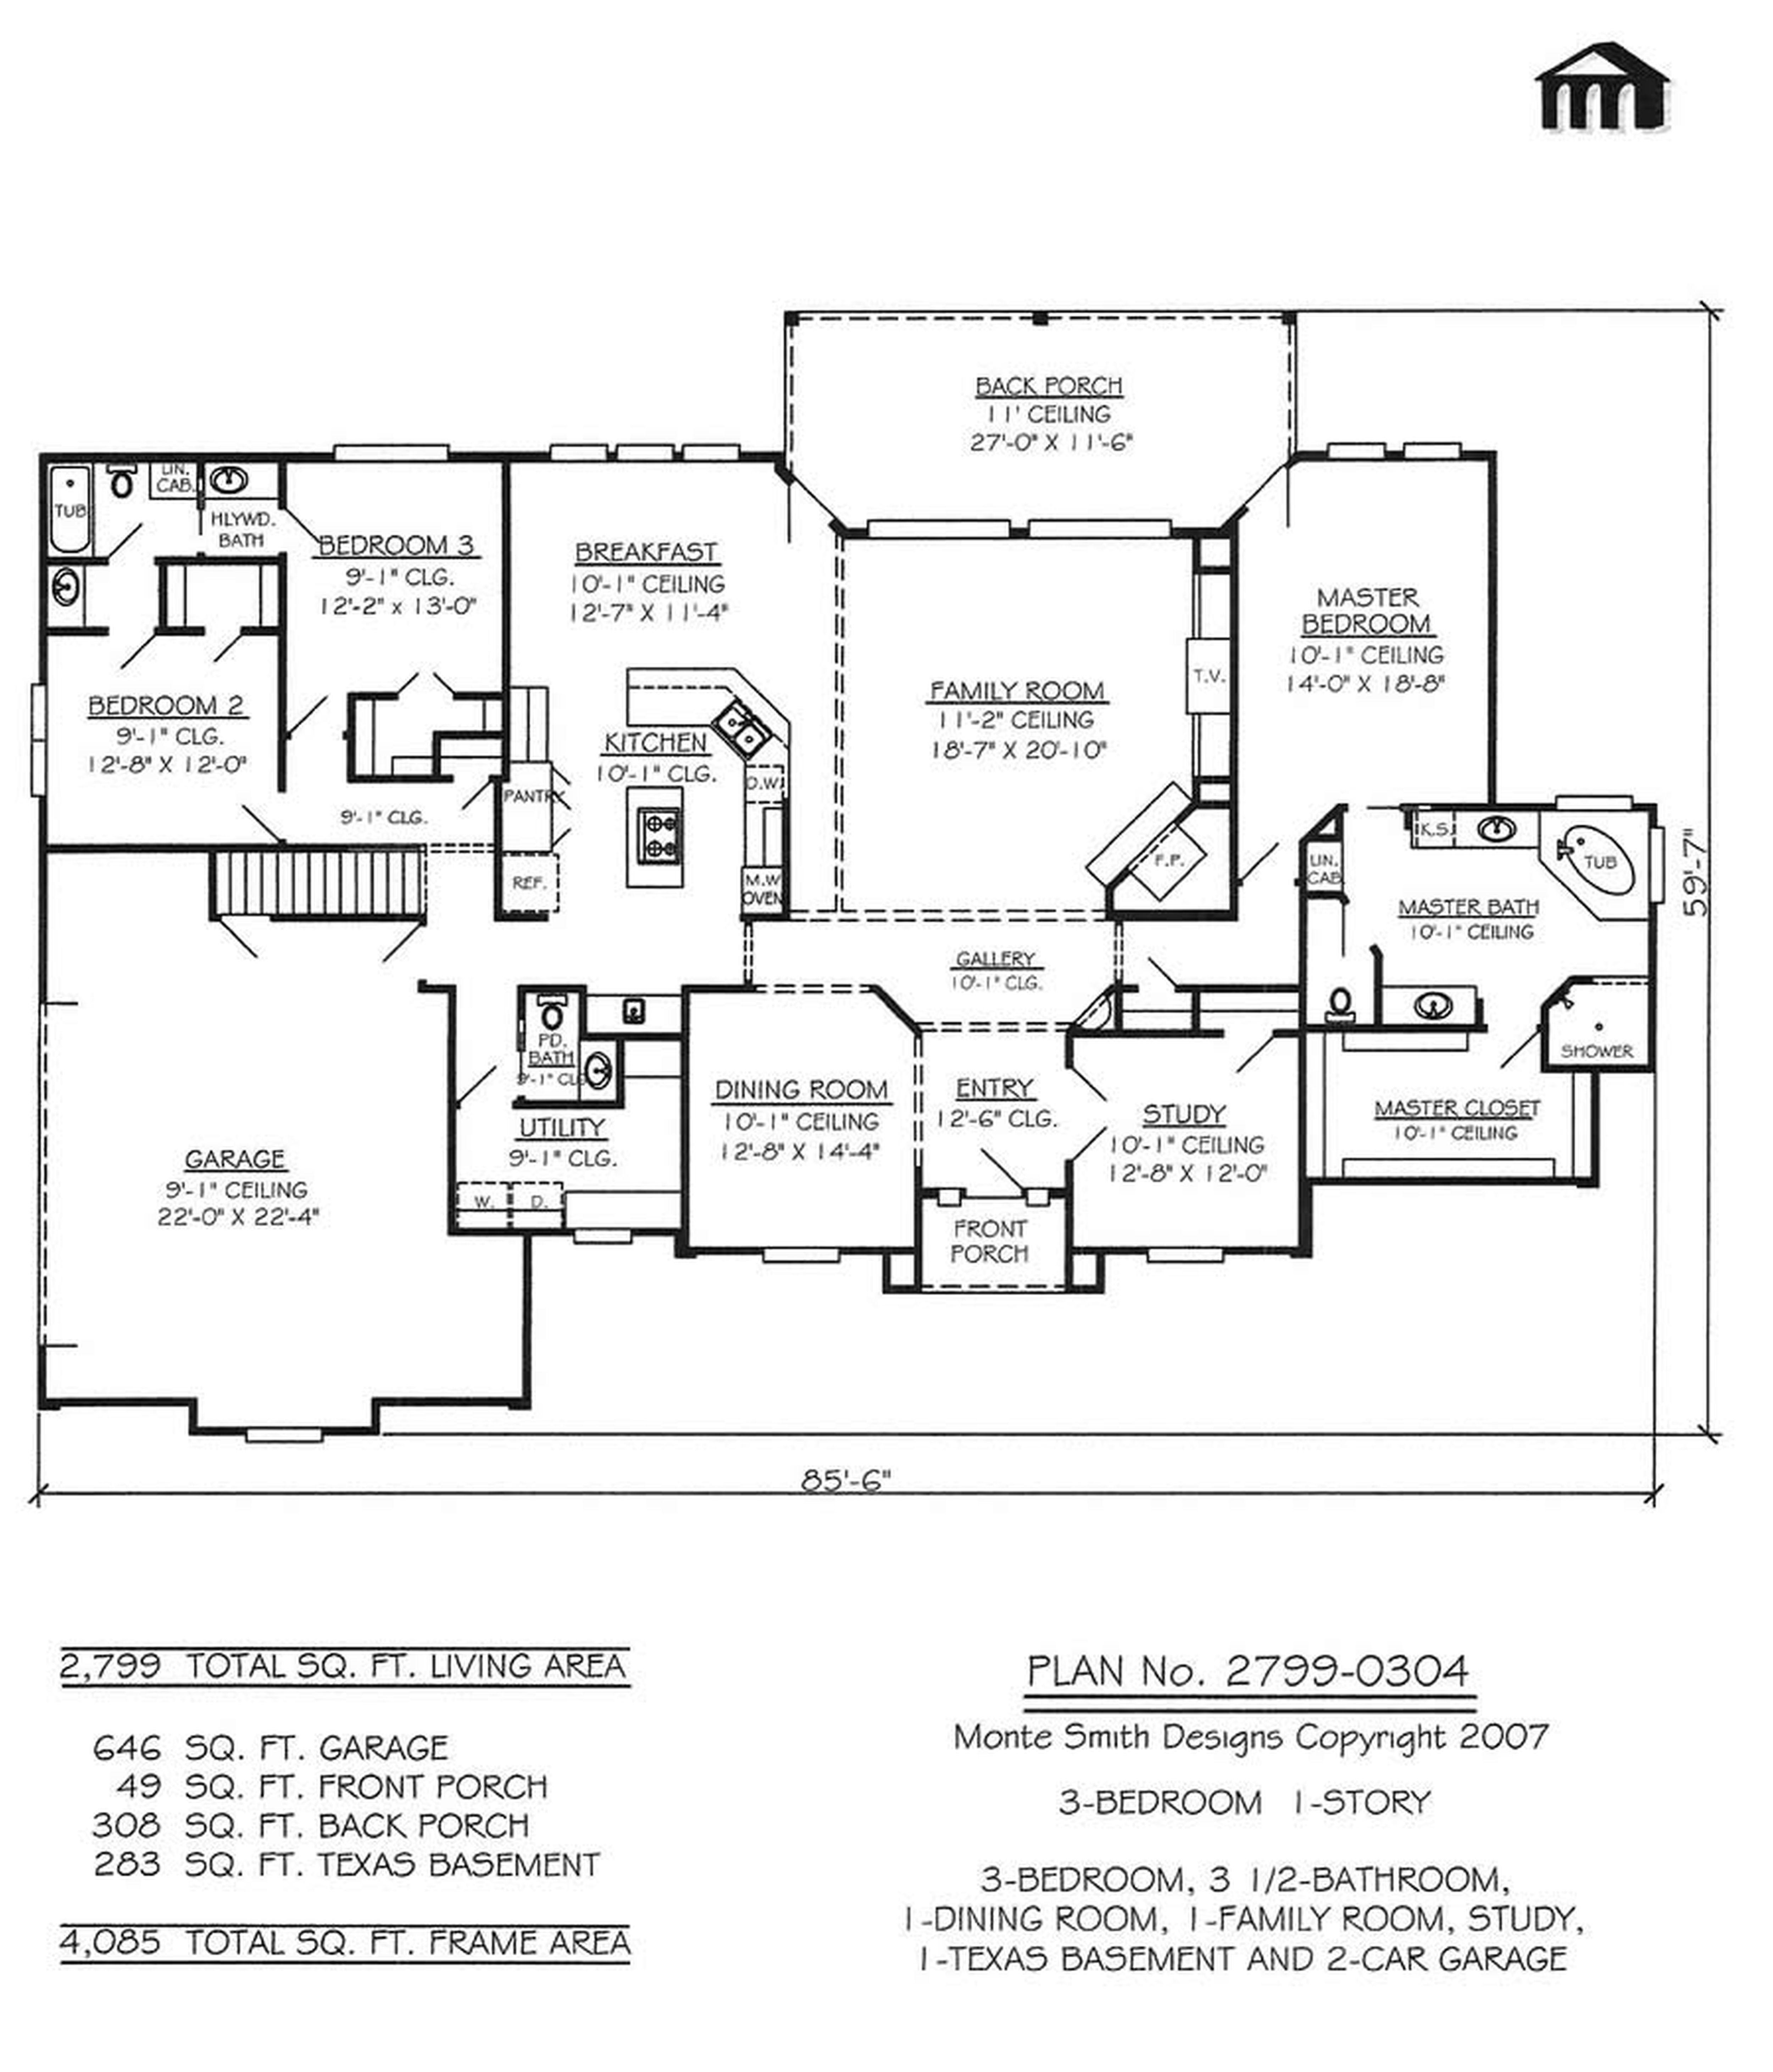 Glamorous 3 Bedroom House Floor Plans With Garage2799 0304 3 Room House Plan Qatmskeb Unique Black White Hous Garage House Plans Garage Floor Plans Floor Plans